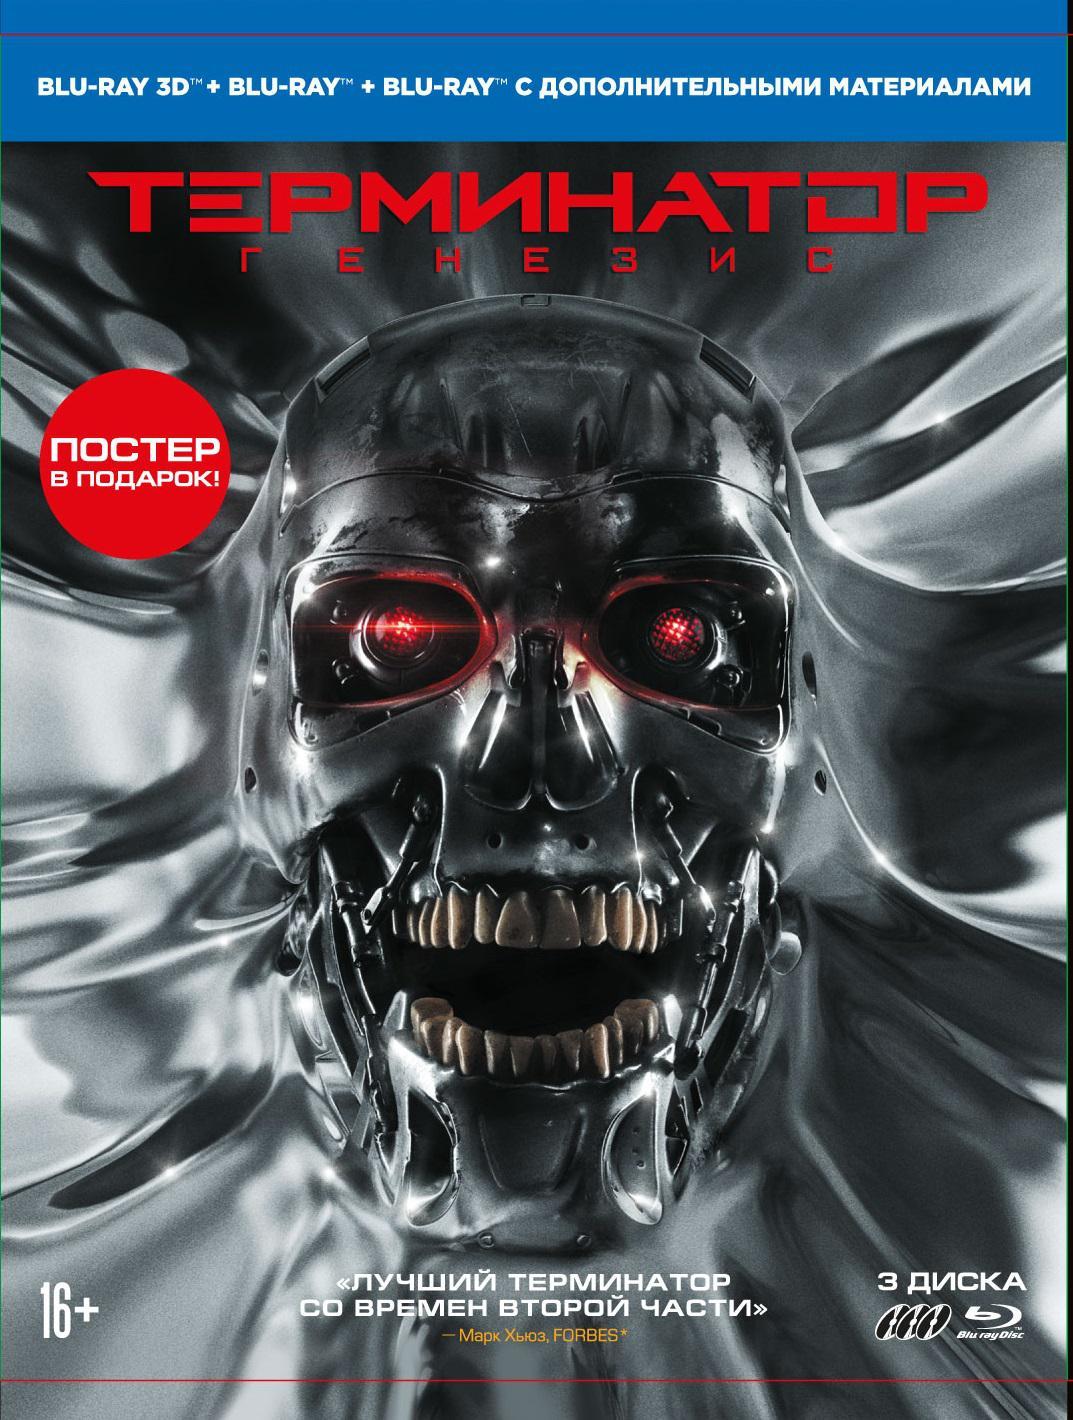 Blu-ray. Терминатор: Генезис (3D+2D). Коллекционное издание (количество Blu-ray: 3)